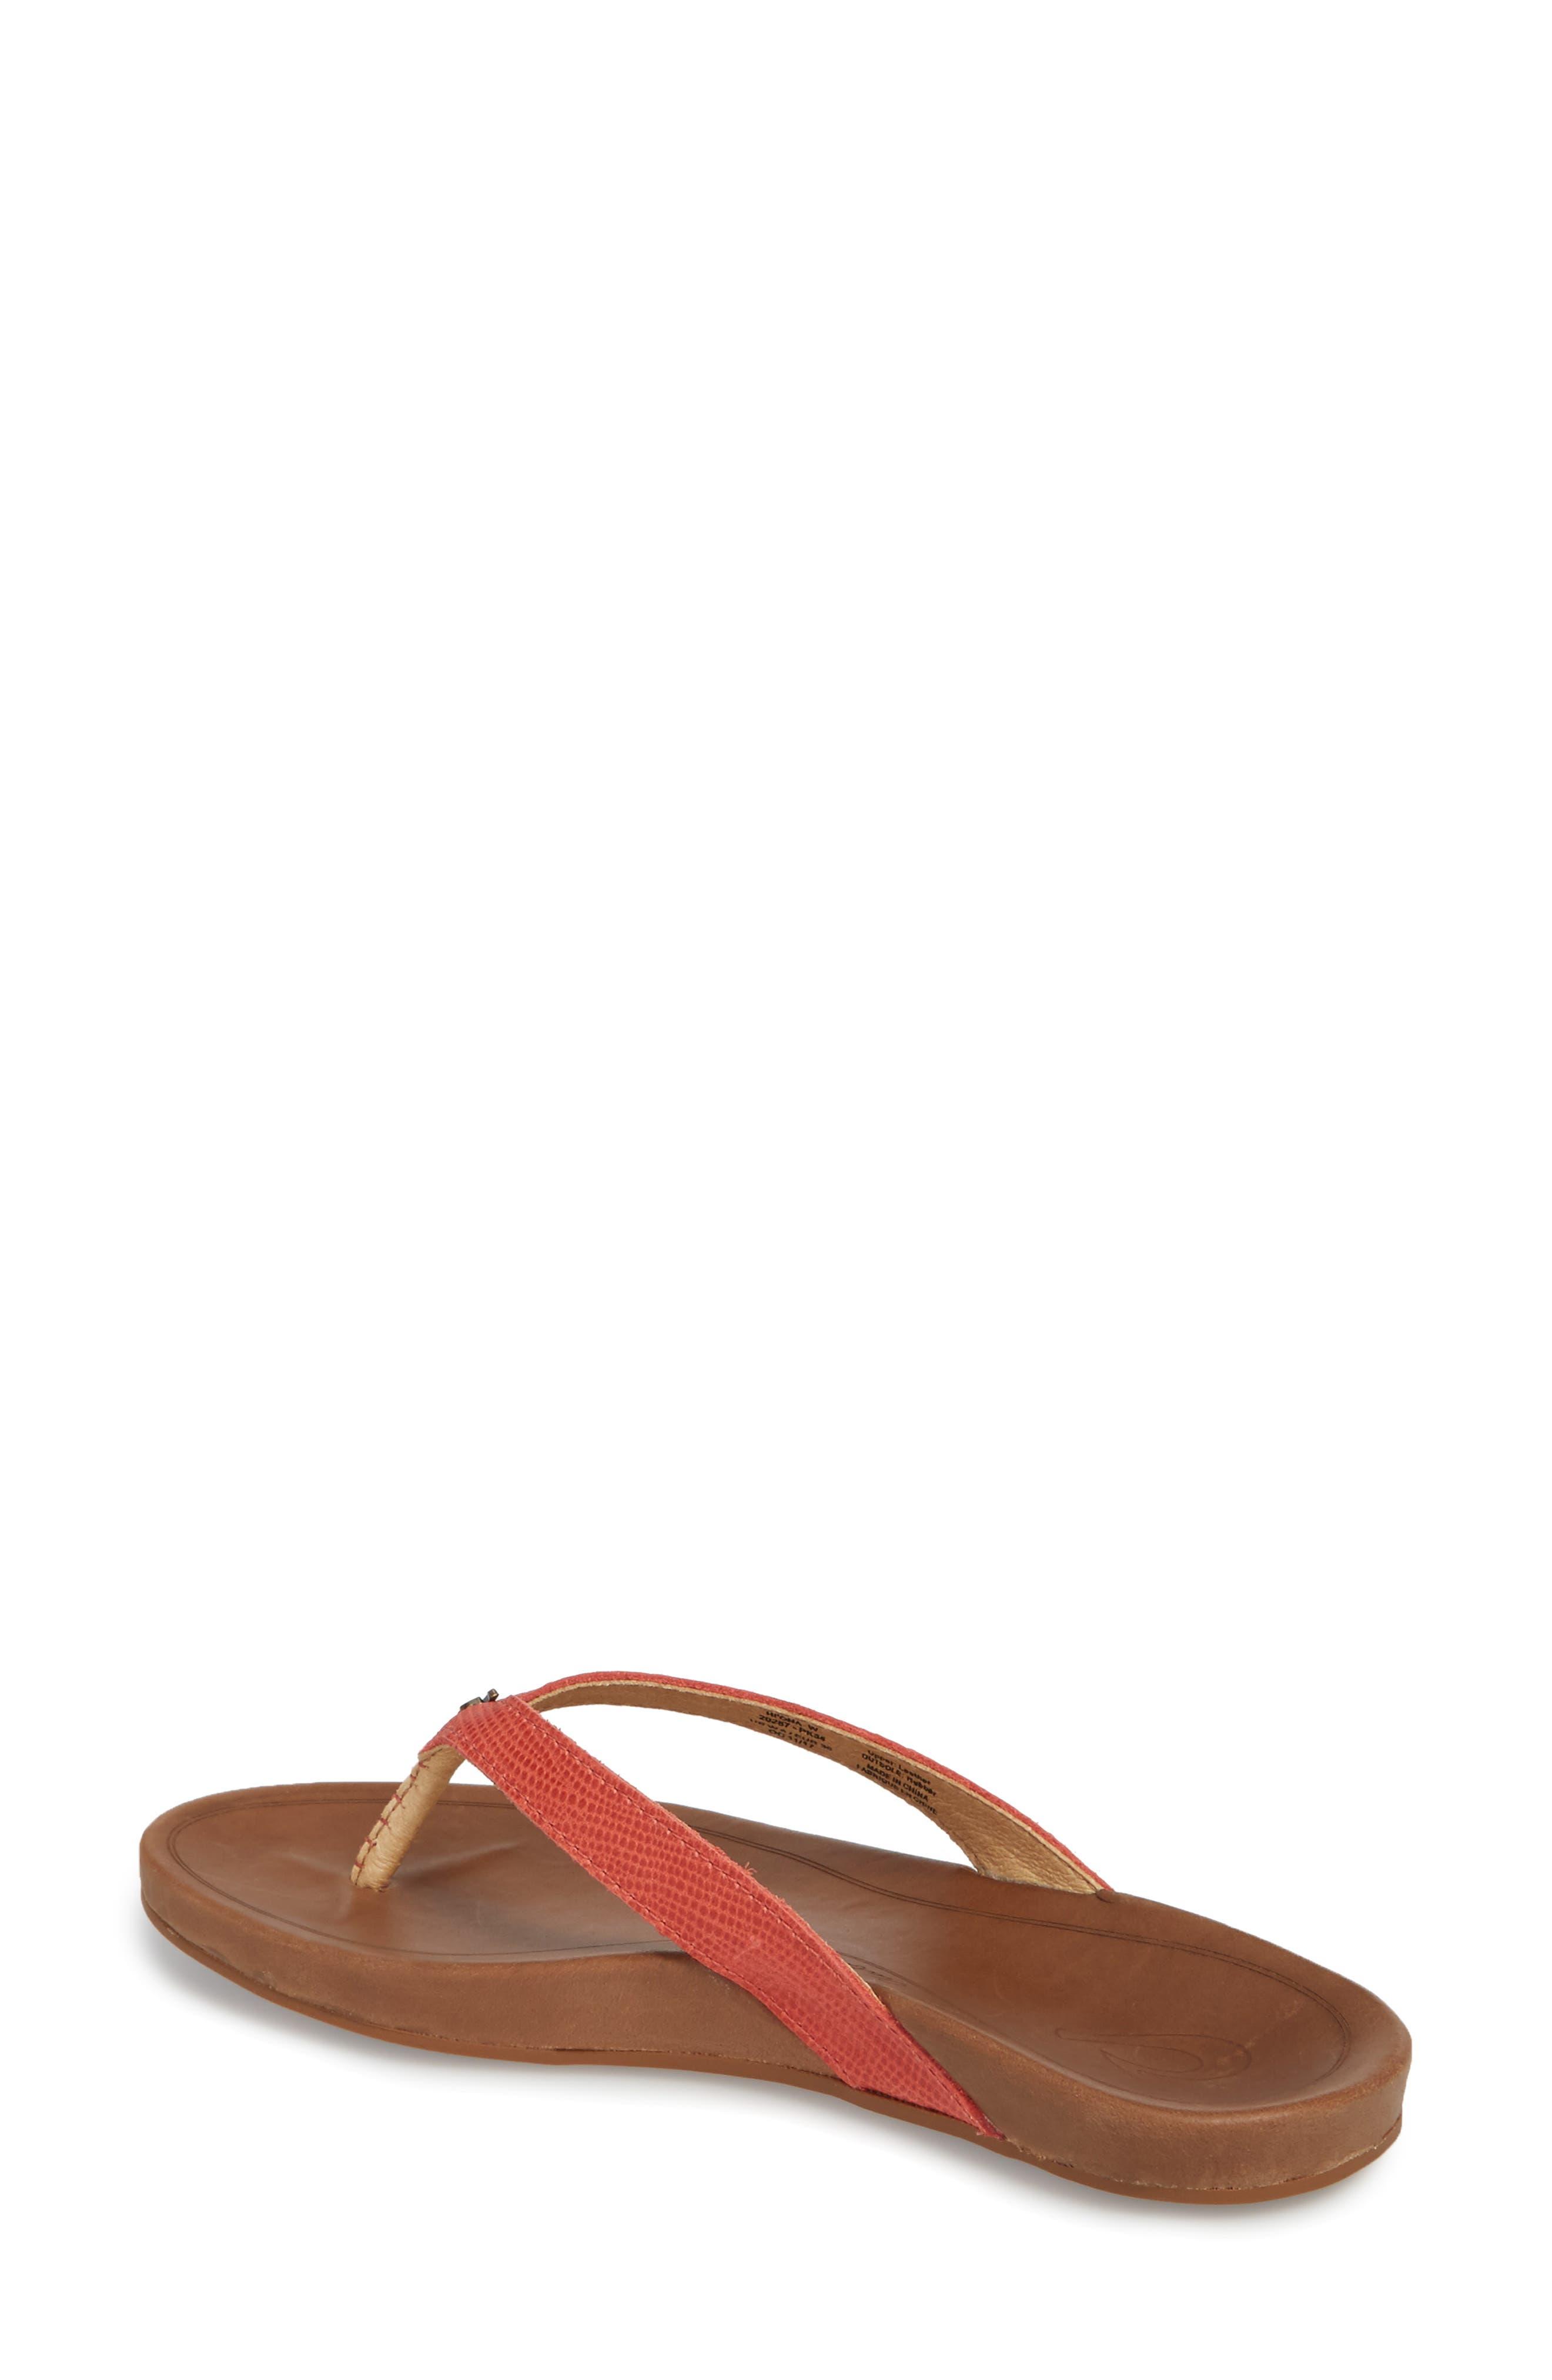 'Hi Ona' Flip Flop,                             Alternate thumbnail 2, color,                             Paprika/ Tan Leather